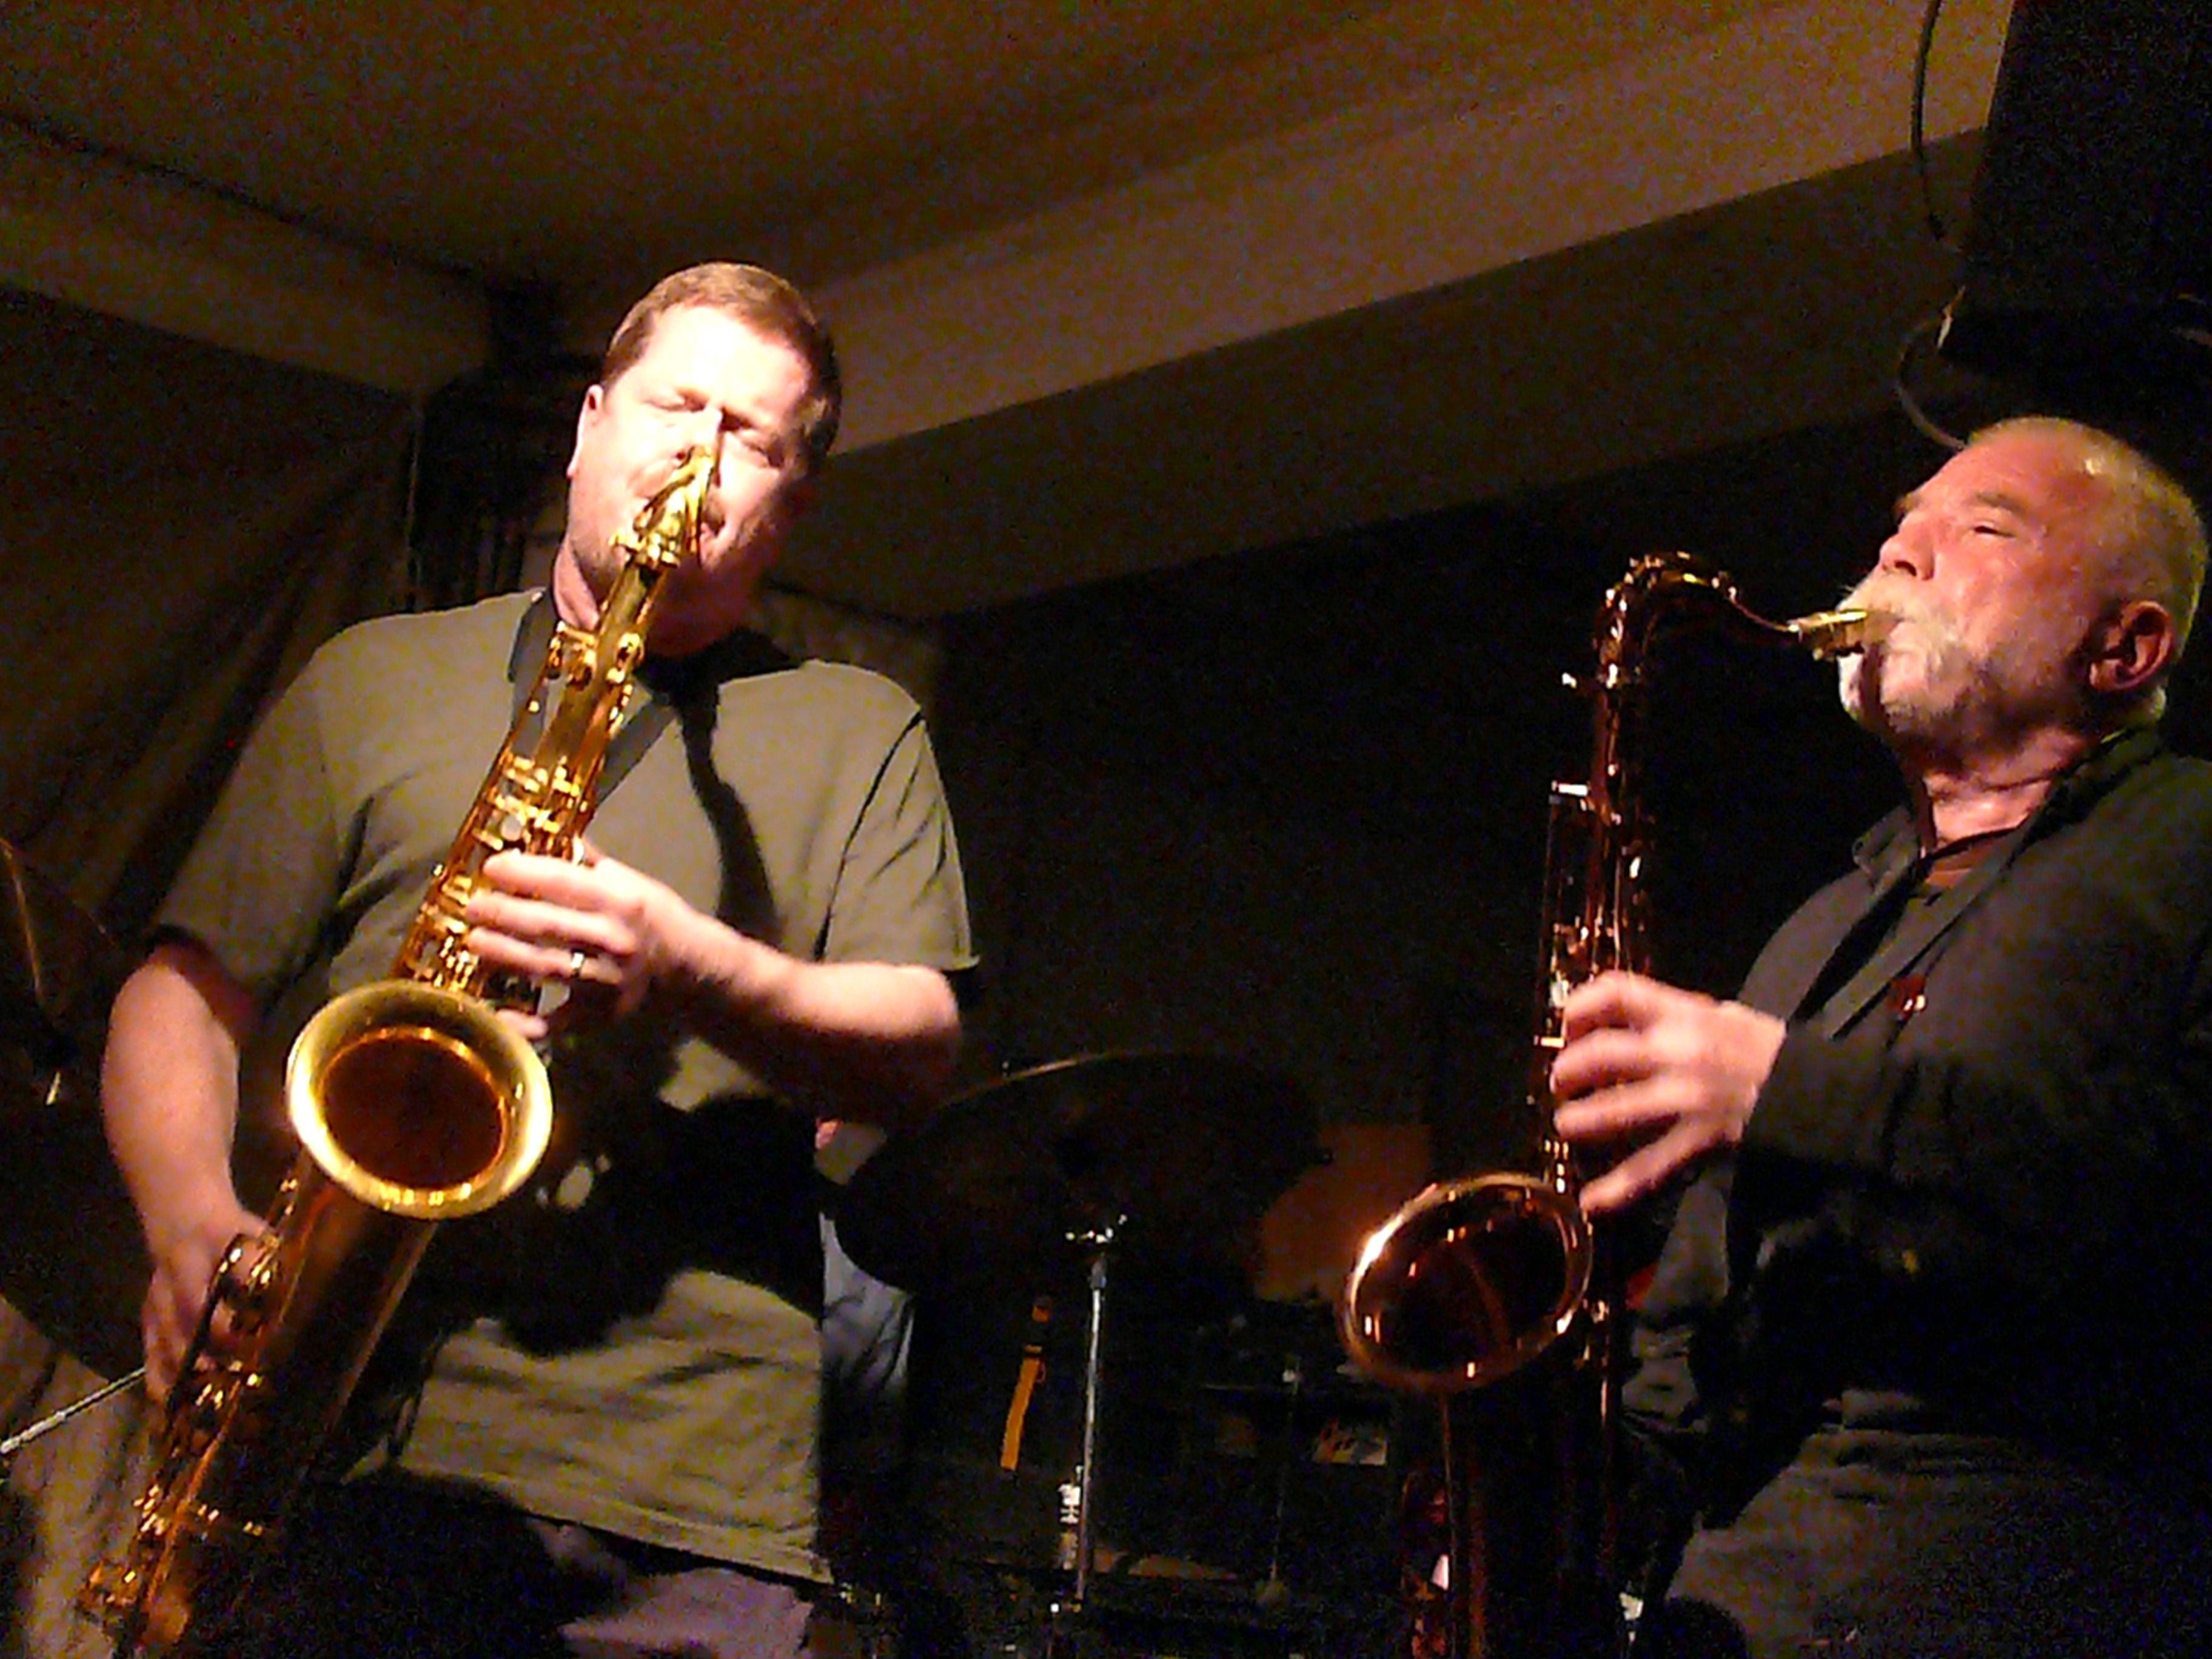 Ken Vandermark and Peter Brotzmann at Cafe Oto, London